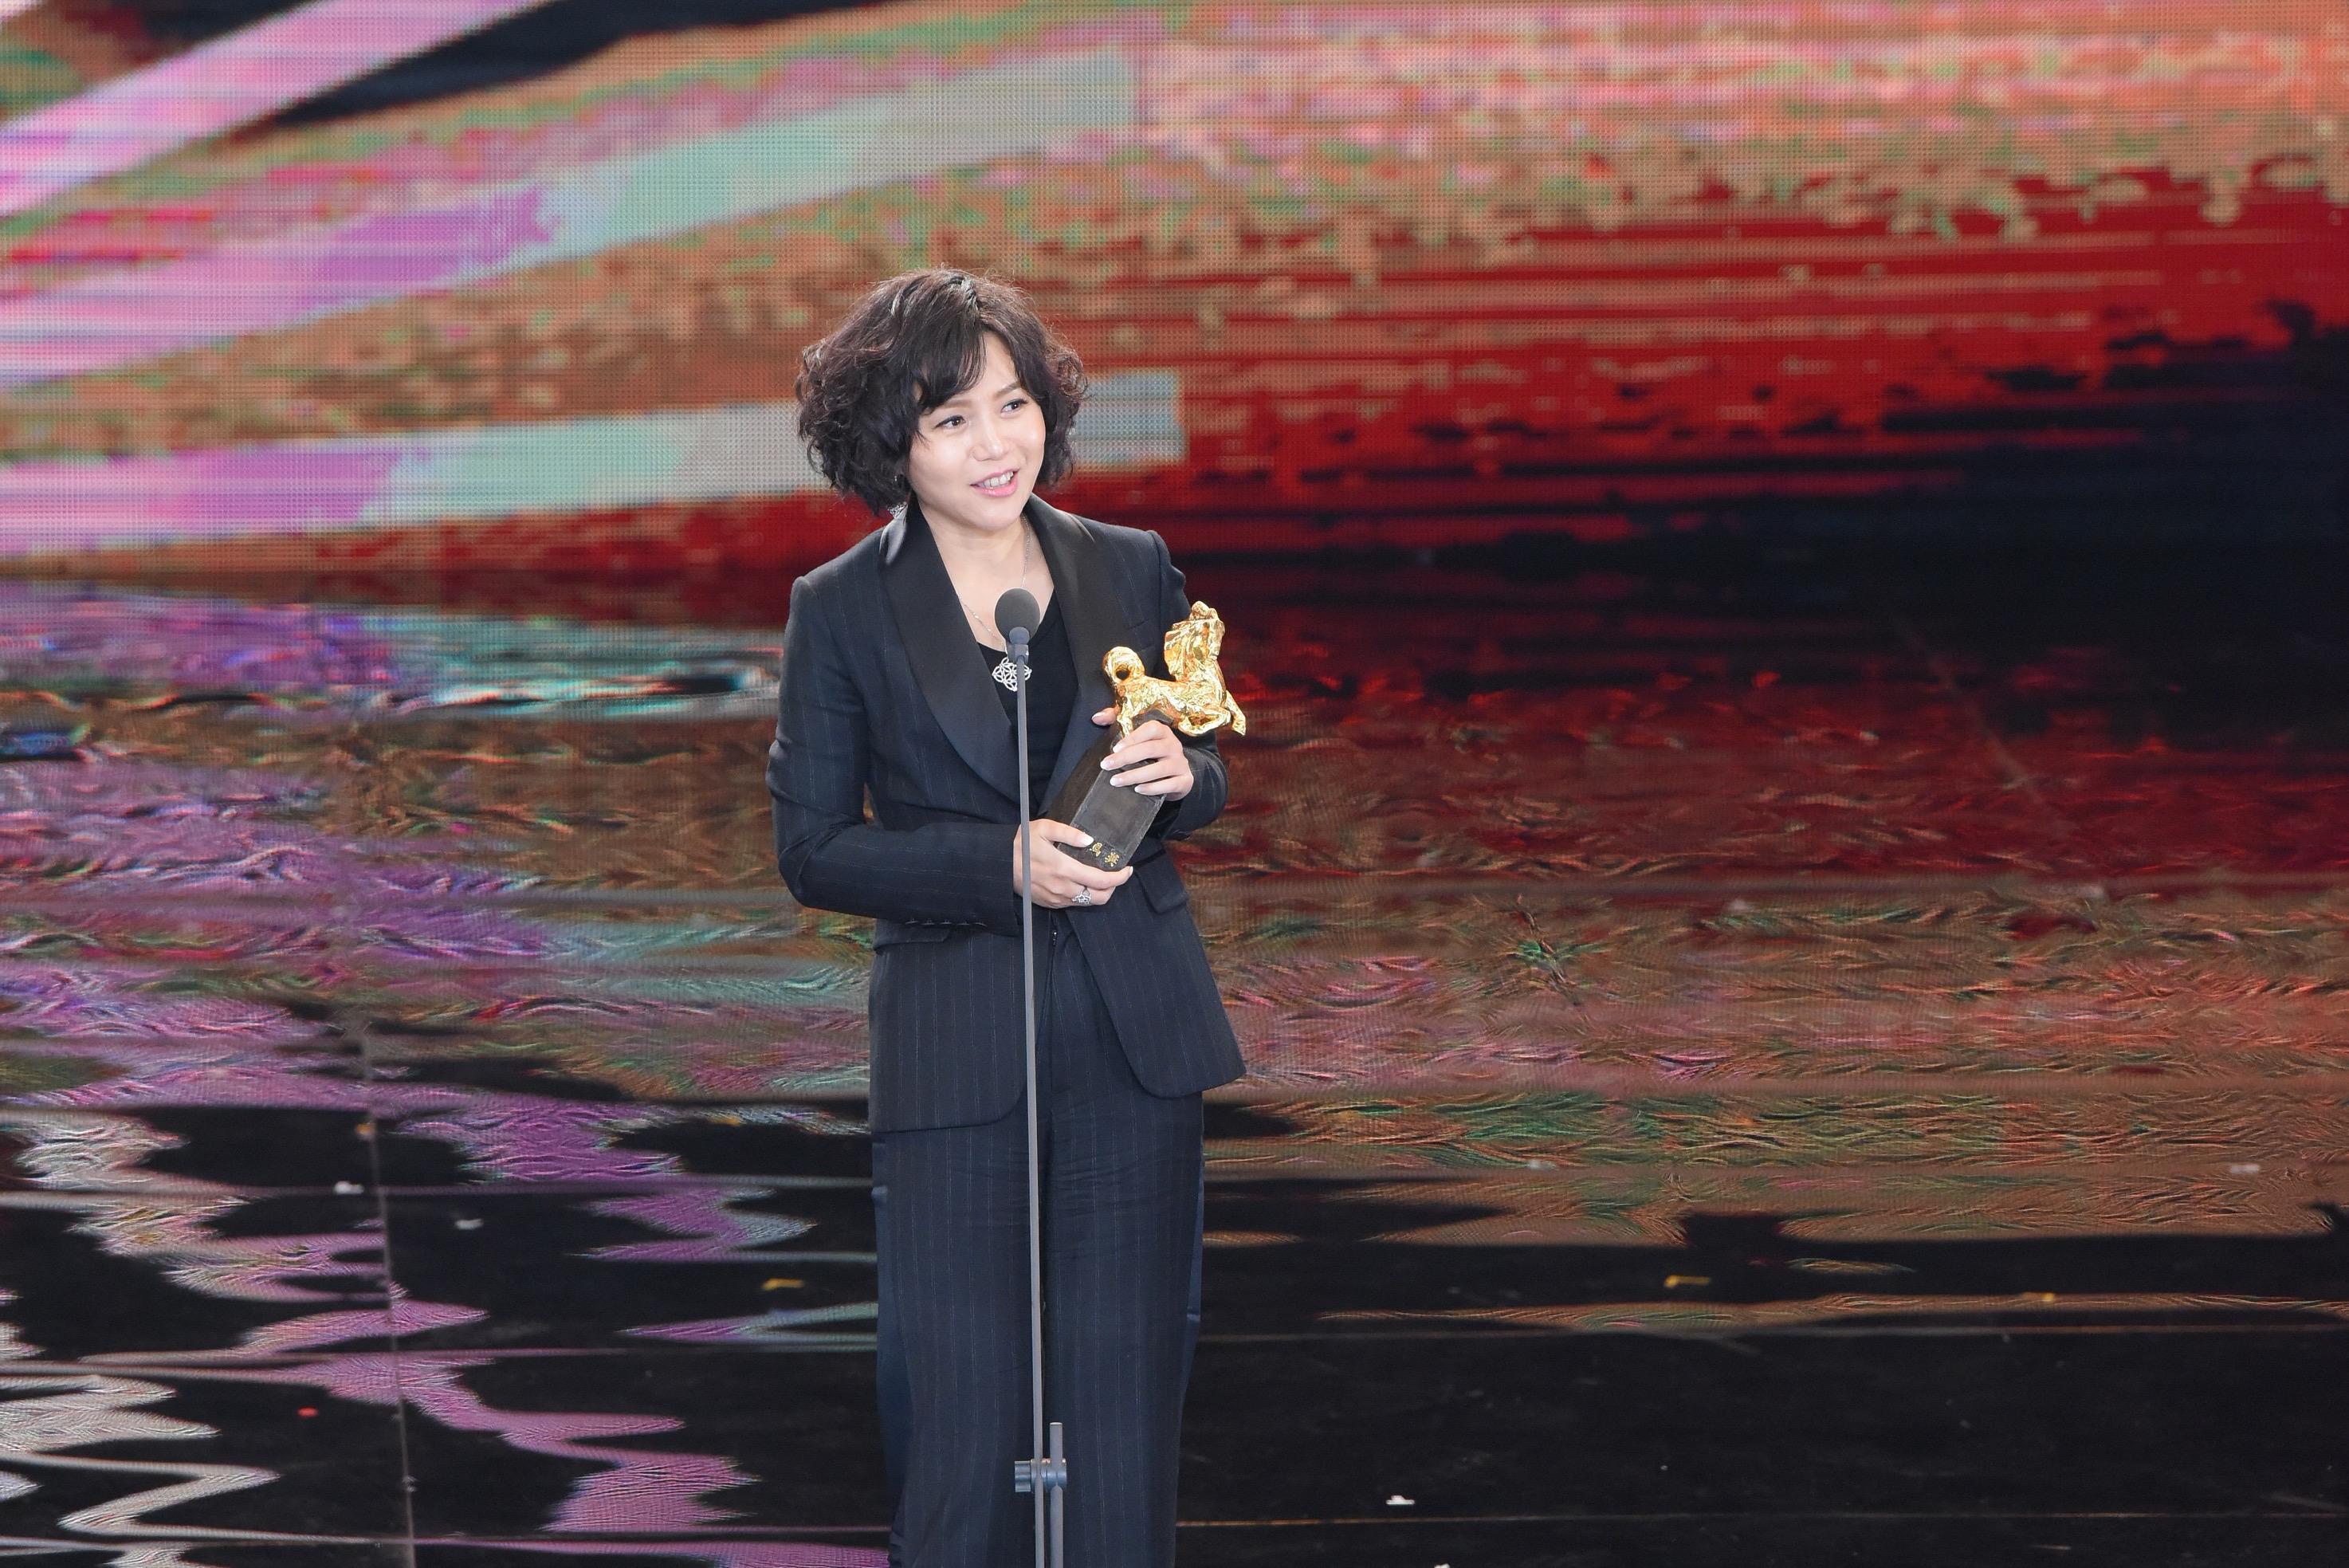 <p>第54屆金馬最佳導演為《嘉年華》文晏,發表獲獎感言時表示:「它《嘉年華》,敘述一個受侵害兒童的故事,它不僅是中國的故事,也是全世界的故事。」(影像:金馬執委會提供) </p>